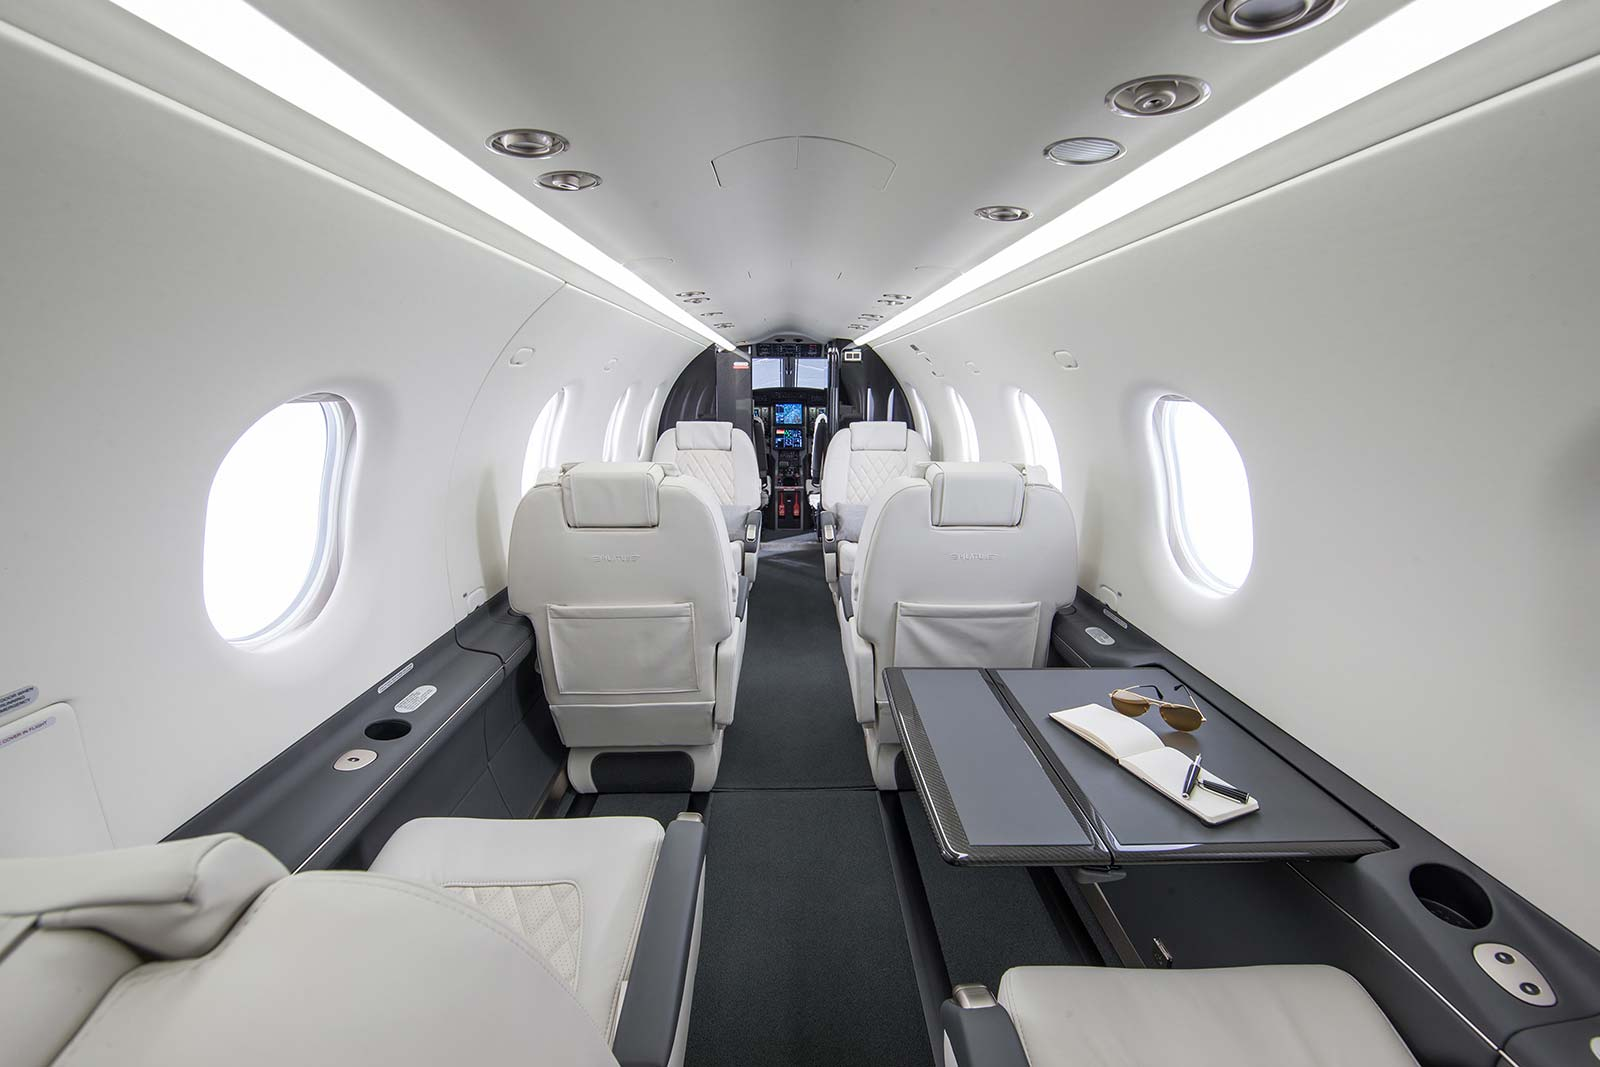 pilatus-pc12-interior-2.jpg